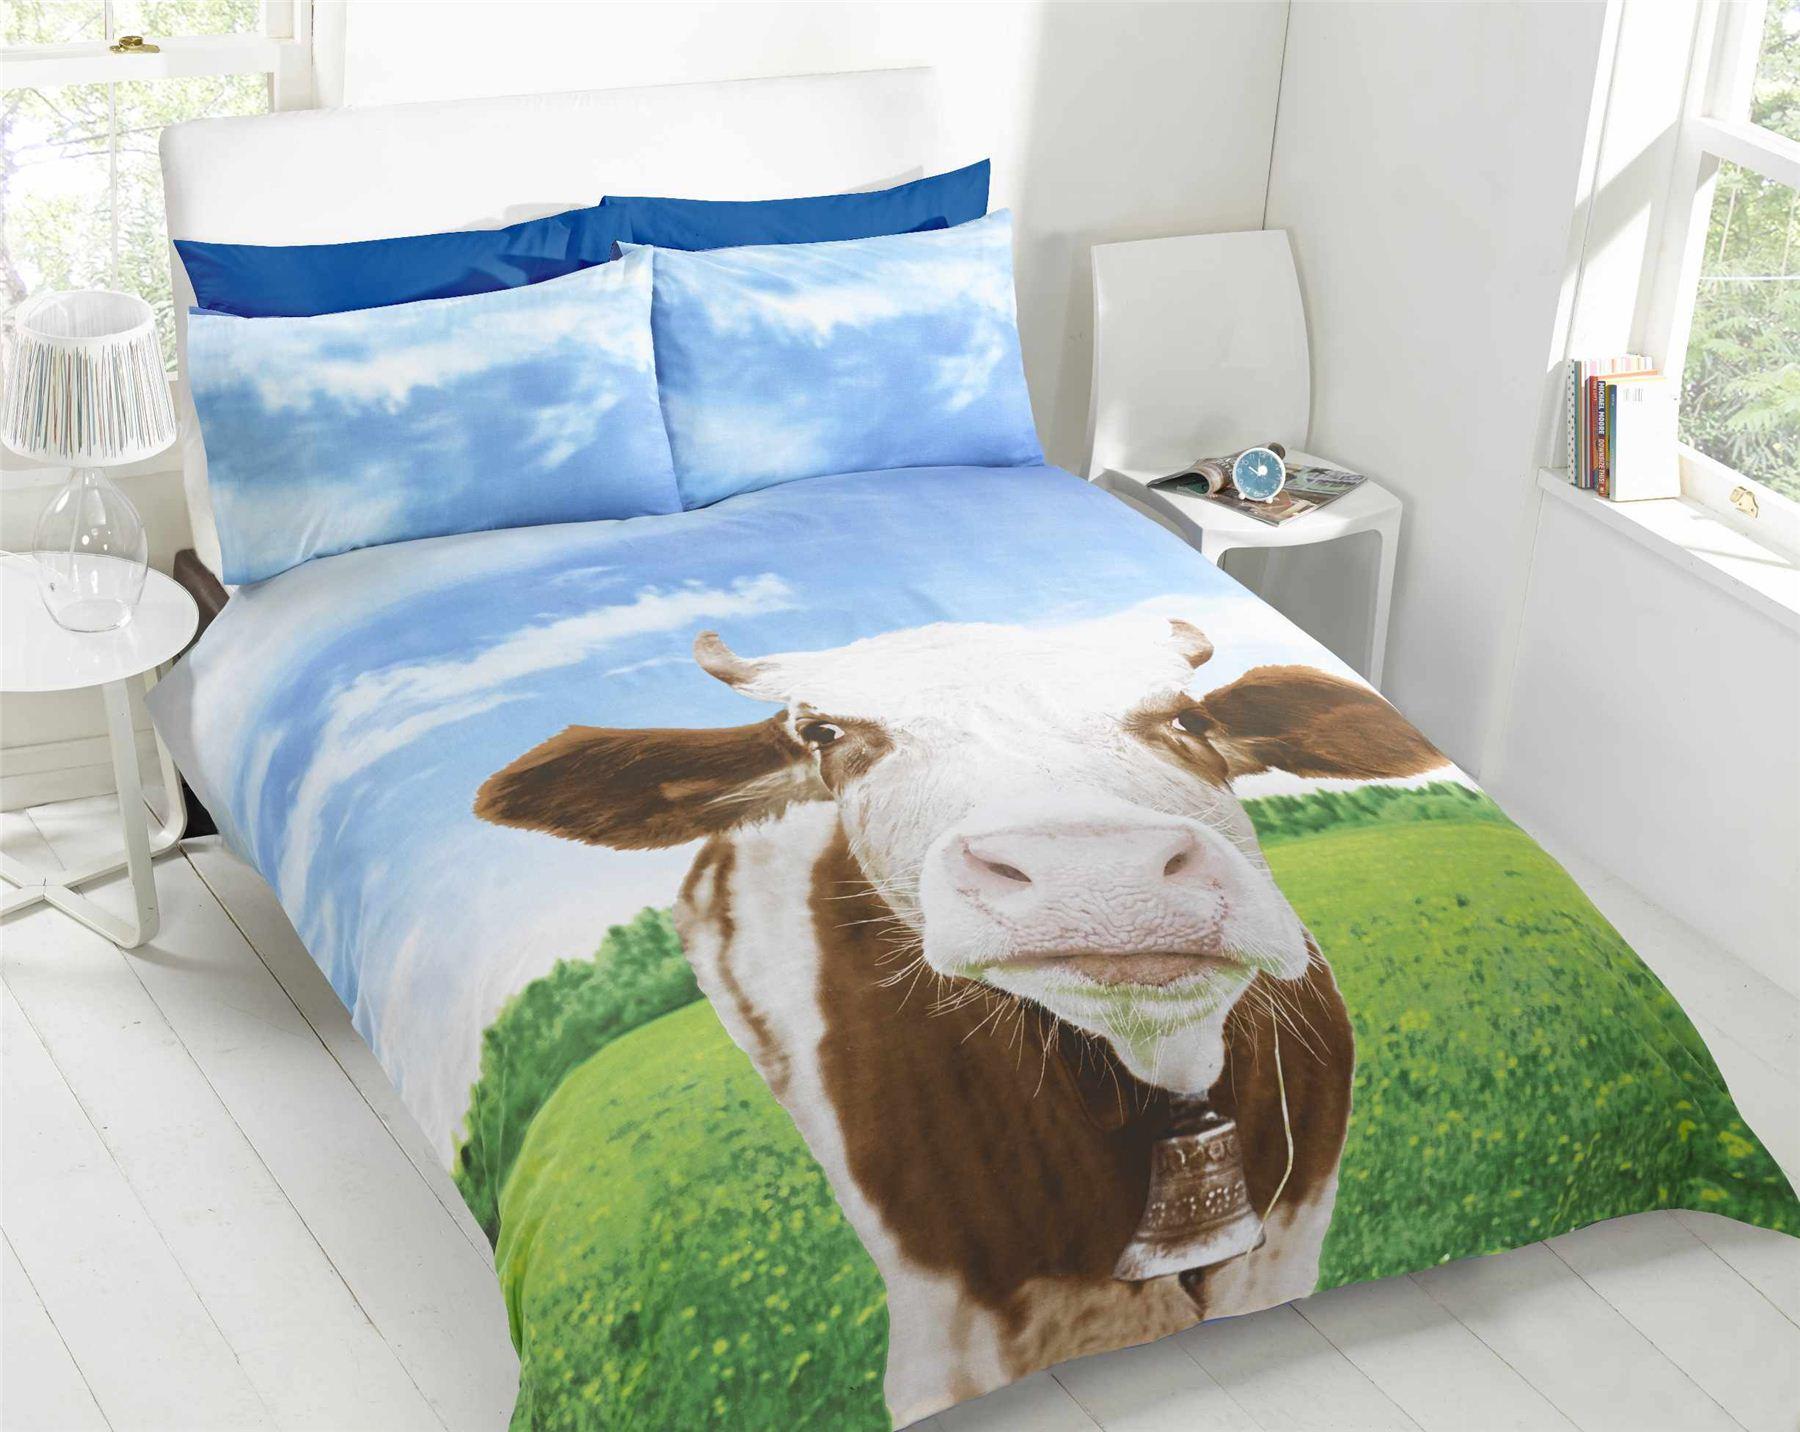 96 fun bedding